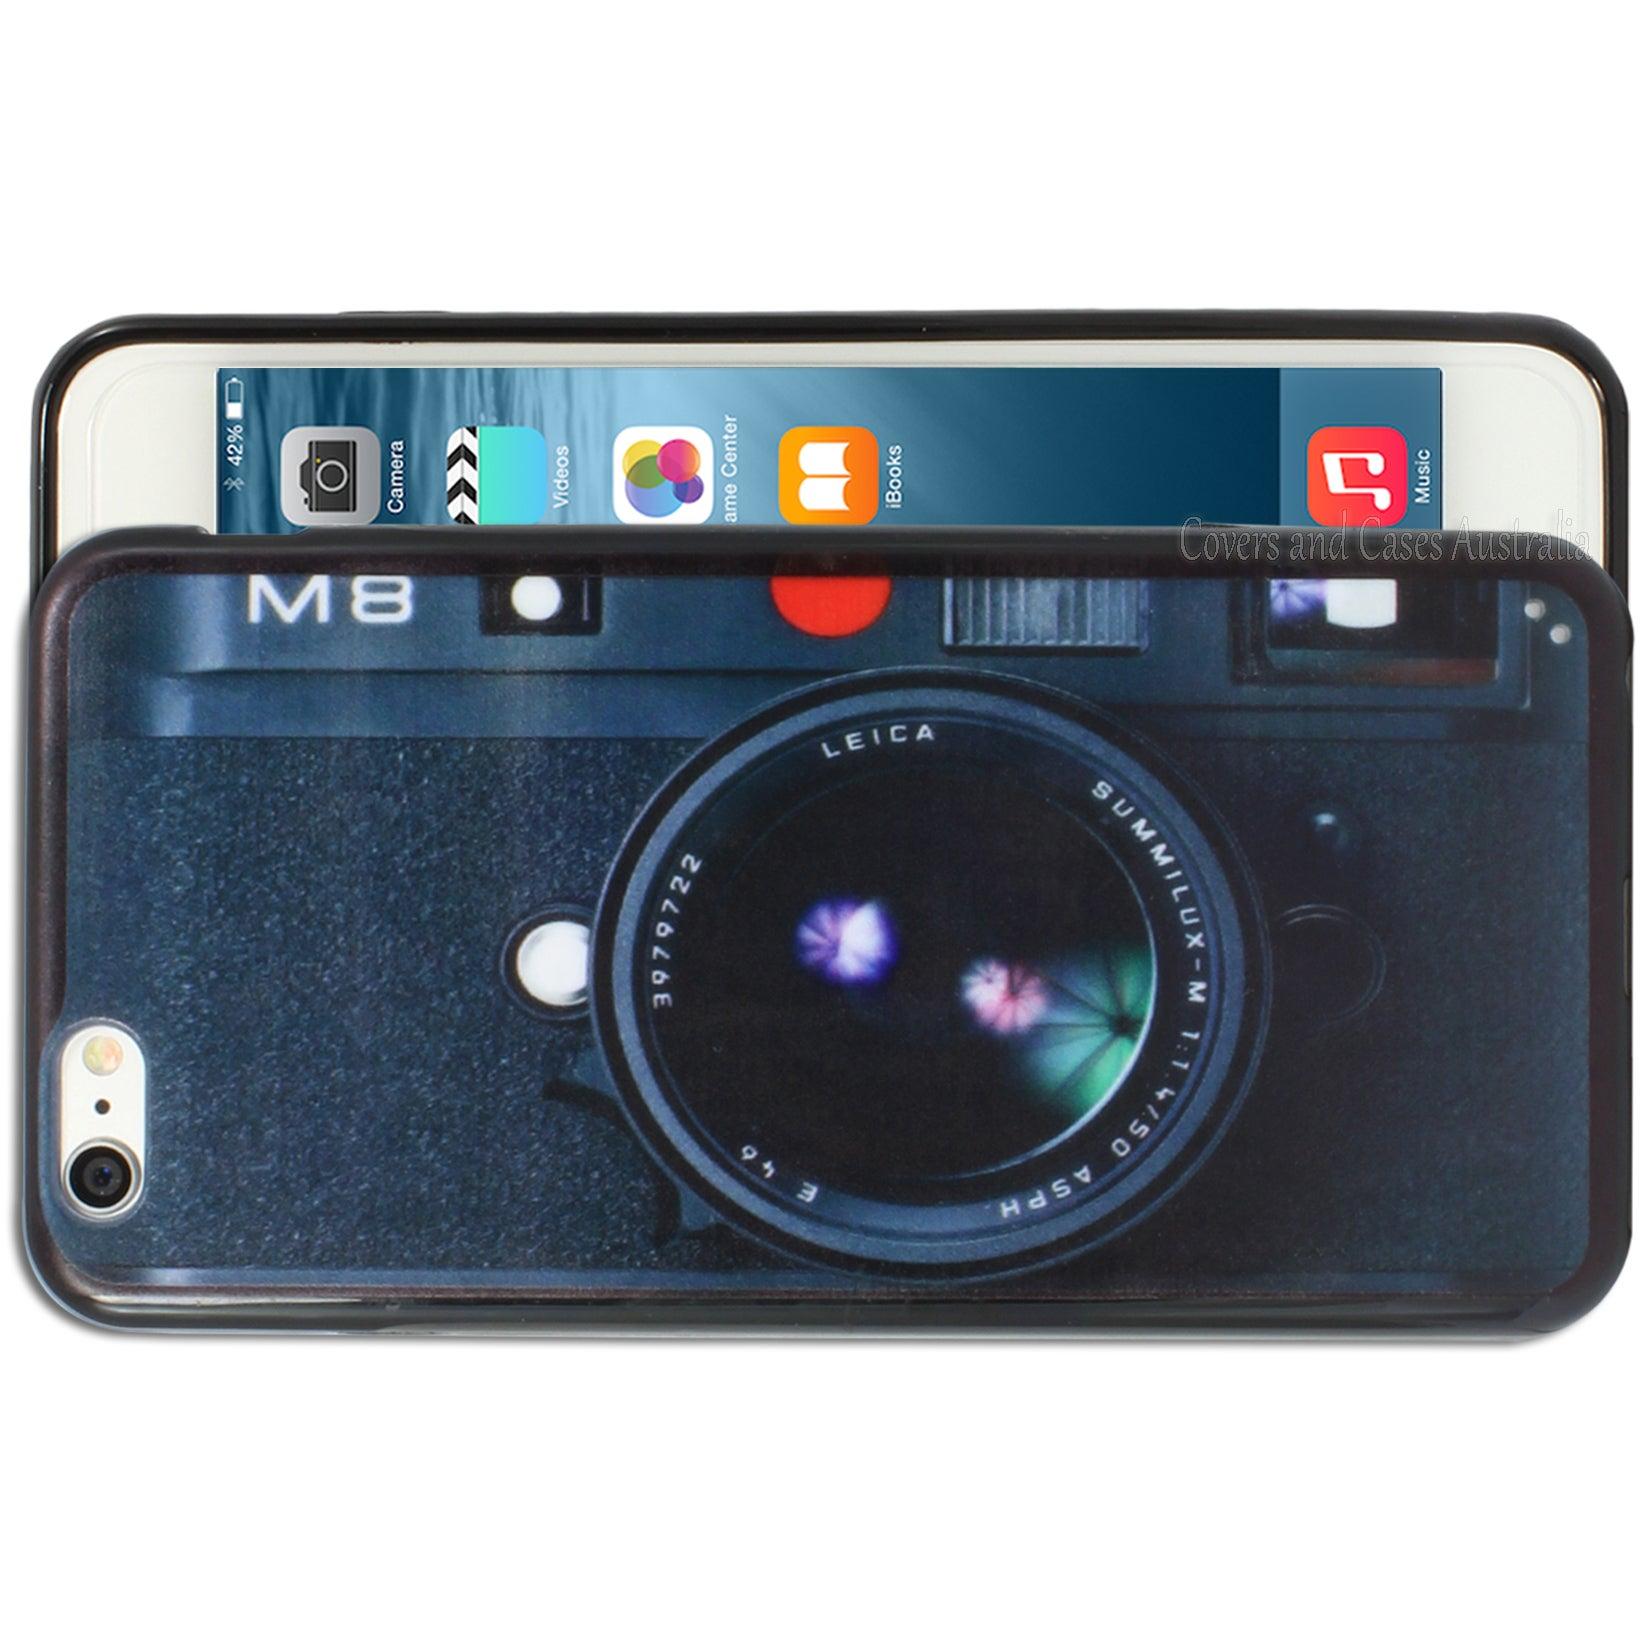 Camera Printed Case for Apple iPhone 6 Plus 6S Plus Cover